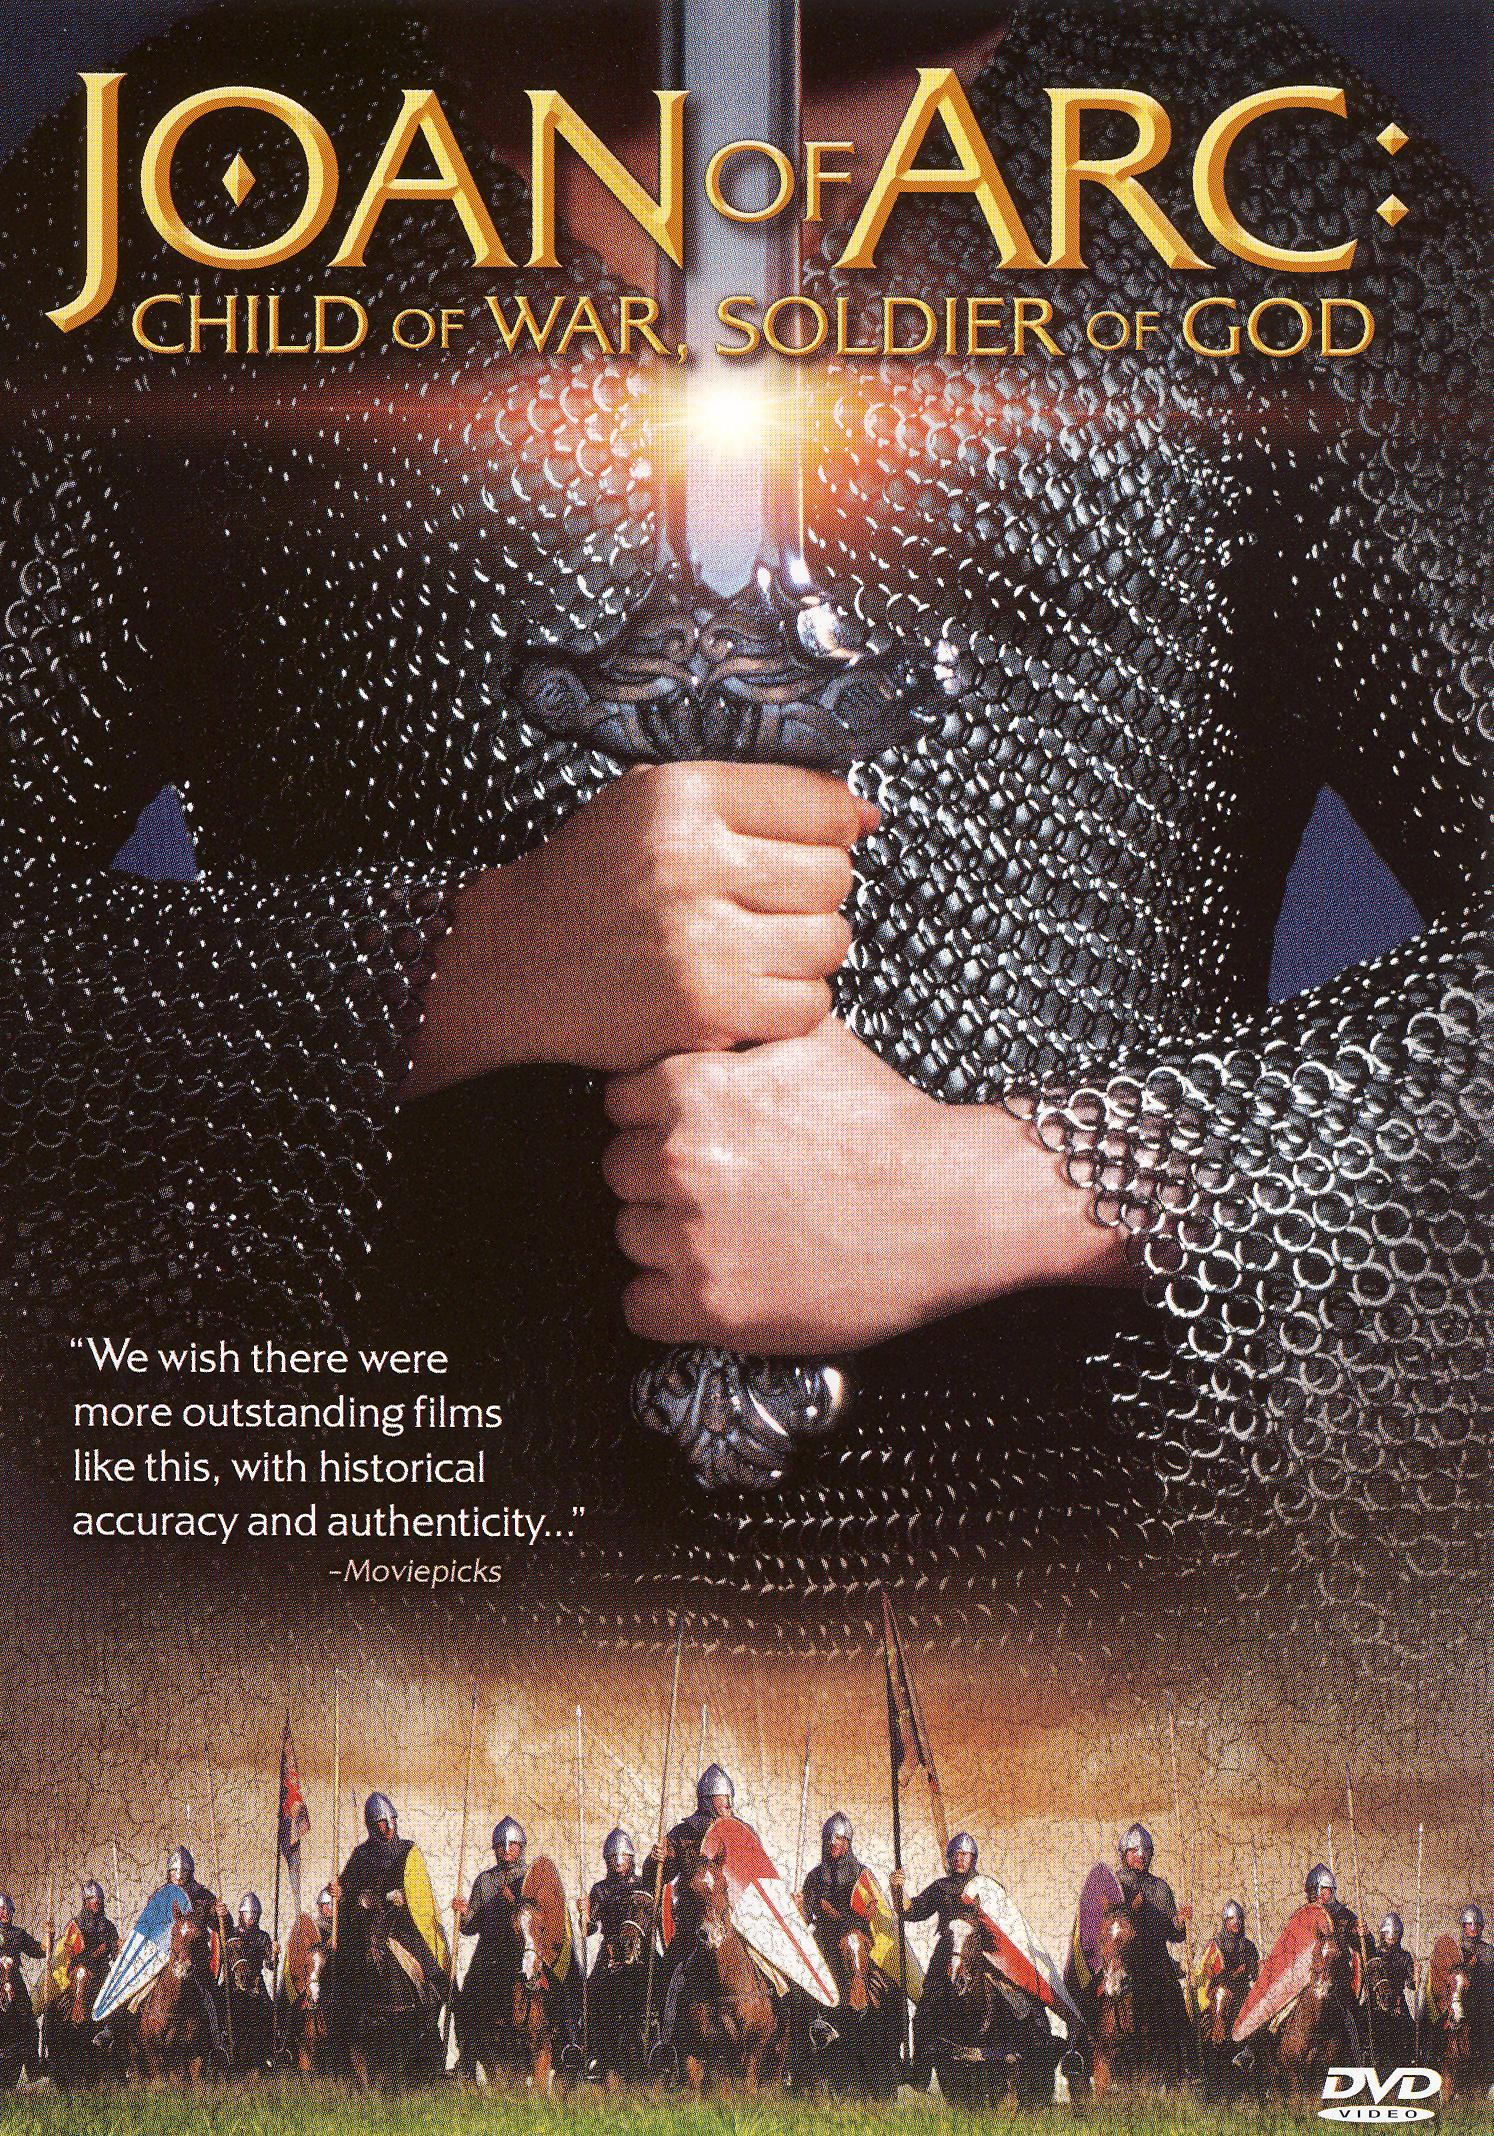 Joan of Arc: Child of War, Soldier of God